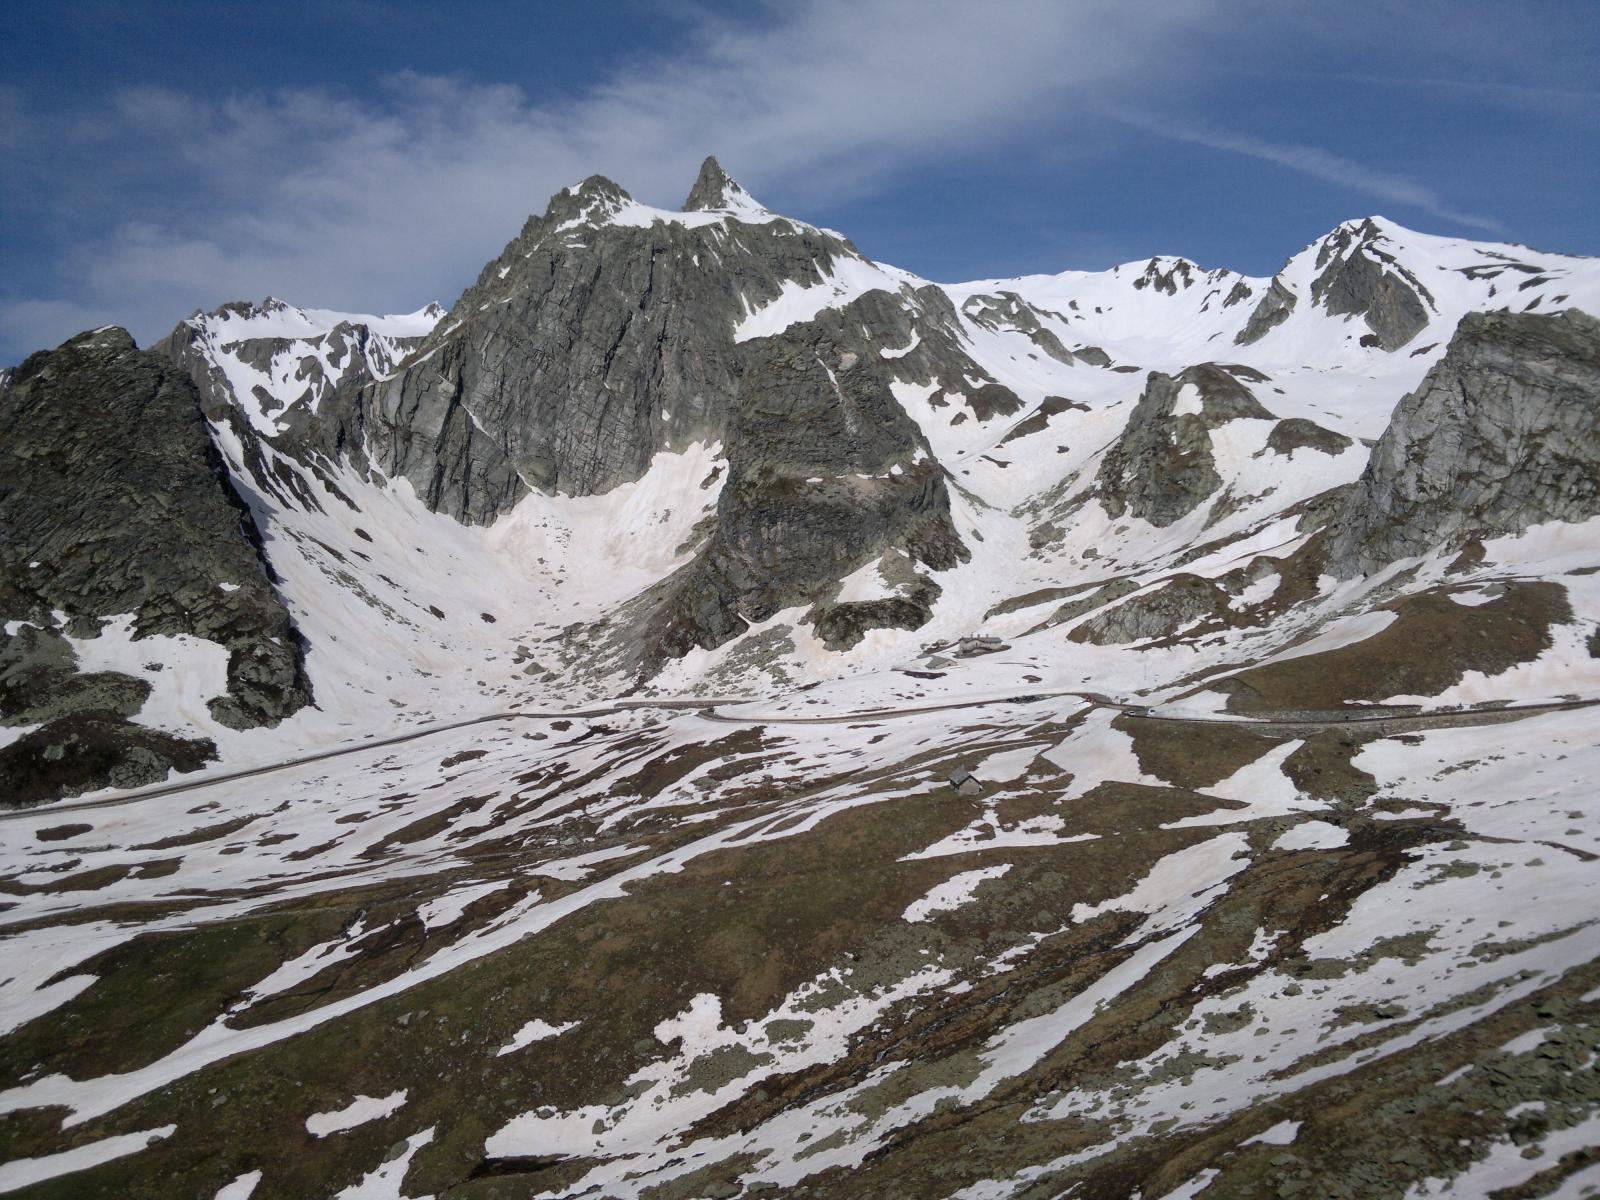 Vista della valle dal passo del Gran Sanbernardo.